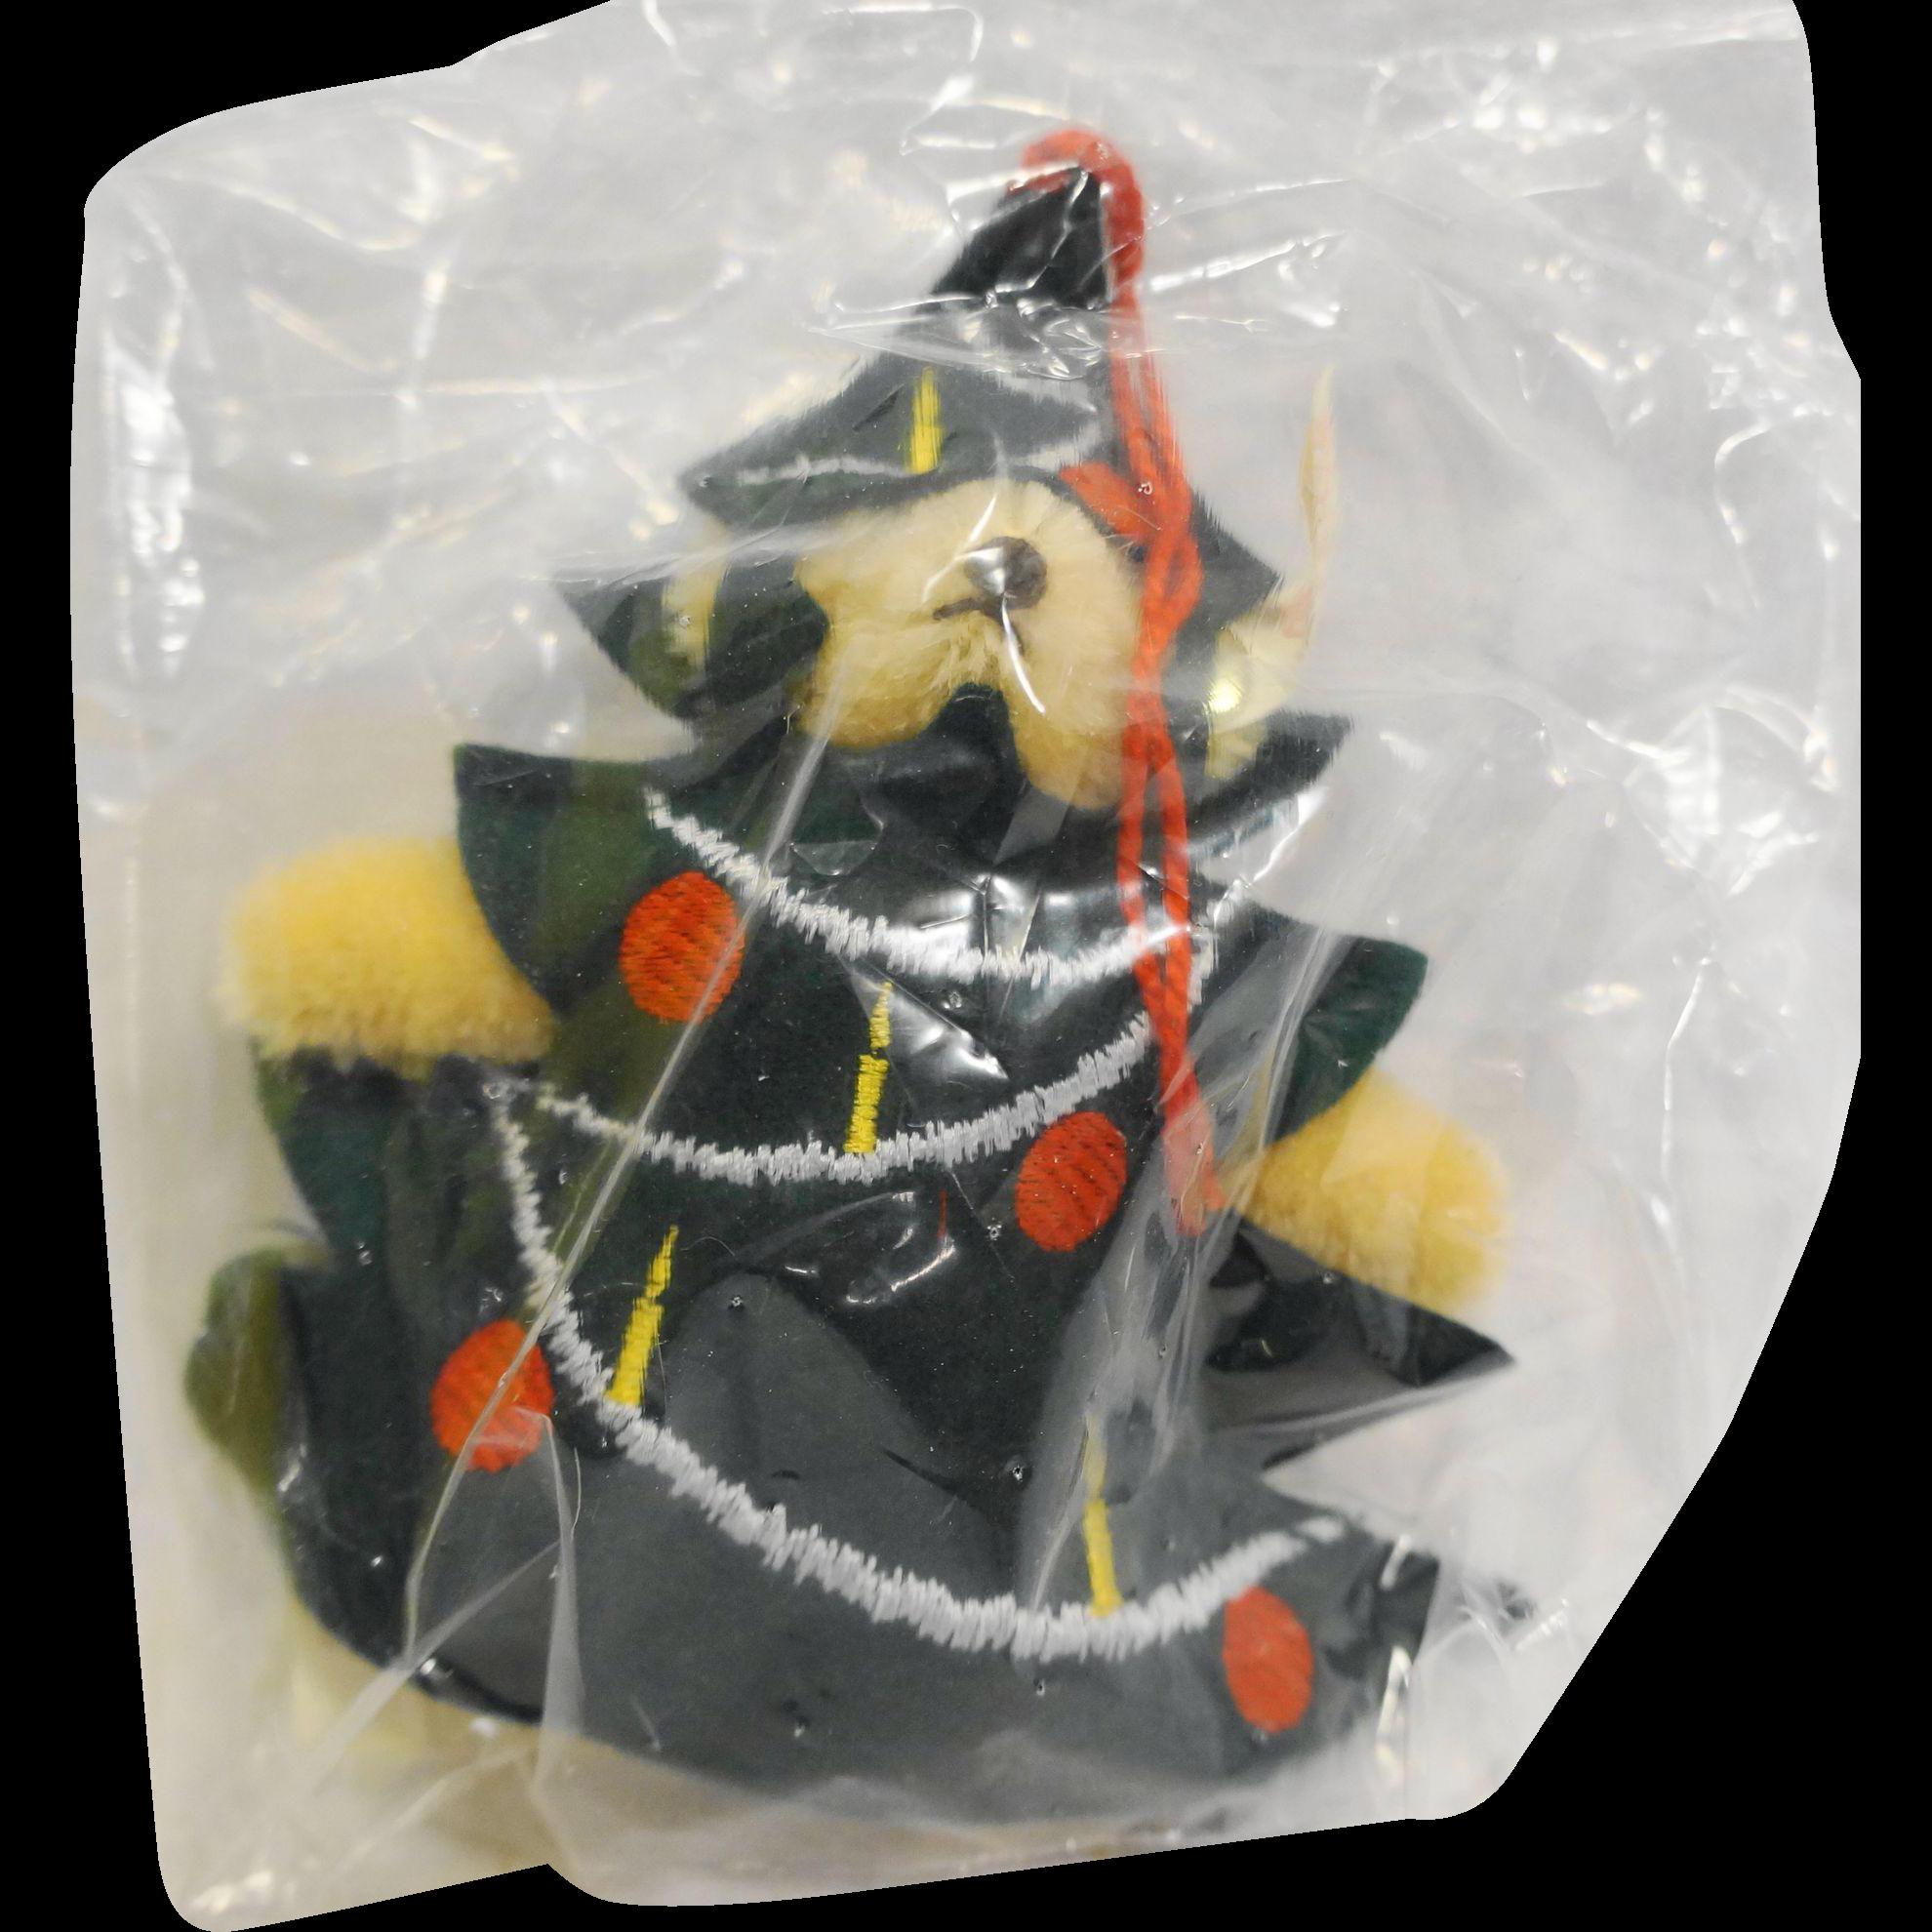 Steiff Evergreen Ornament Teddy Christmas Tree EAN 665417 12 CM 1997 Limited Edition 4000